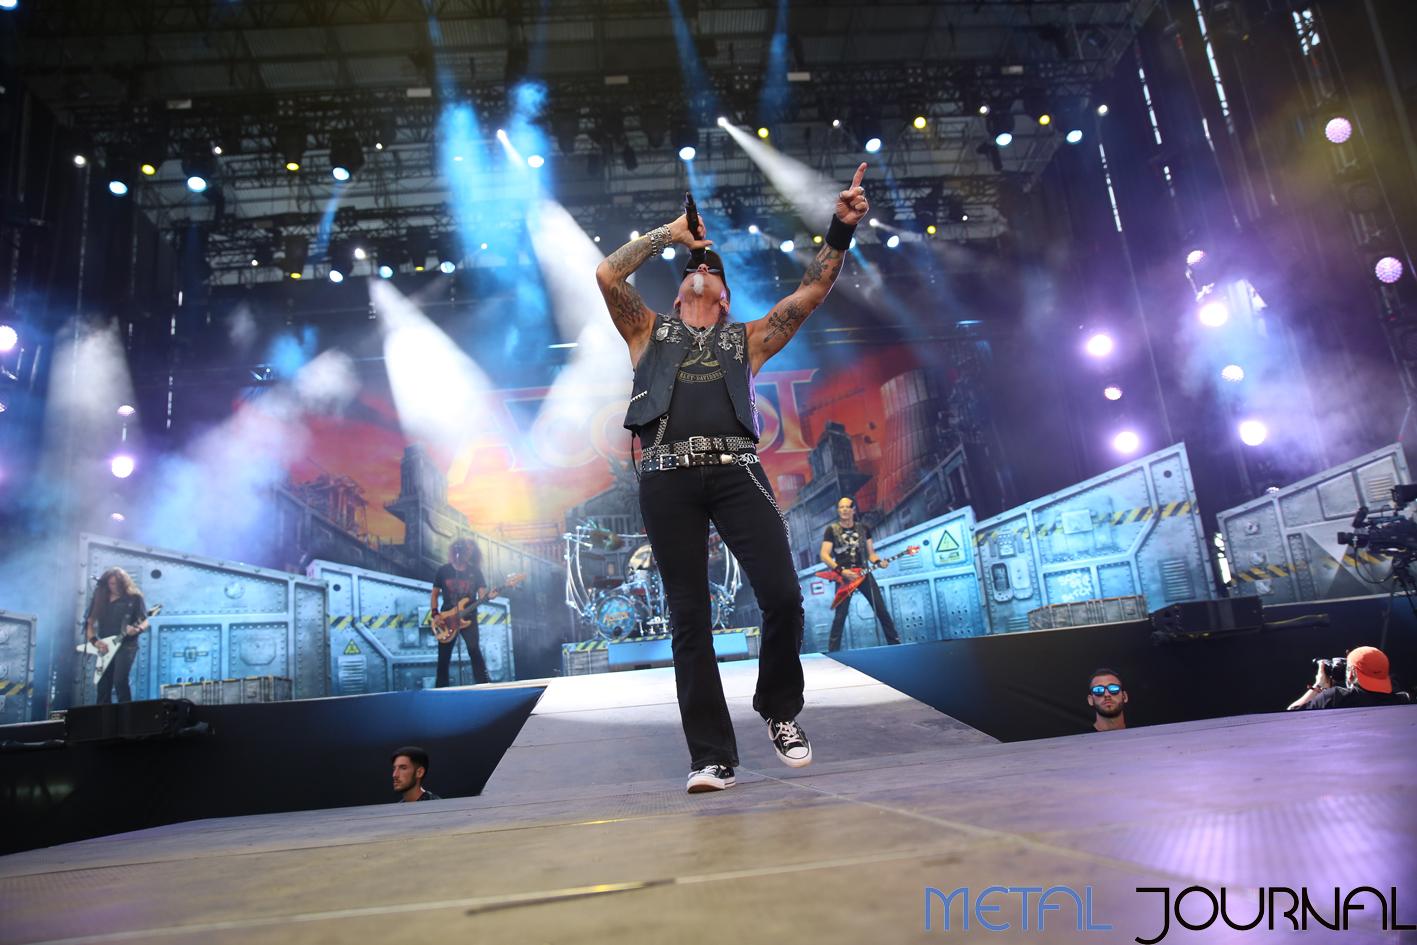 accept rock fest 18 - metal journal pic 2